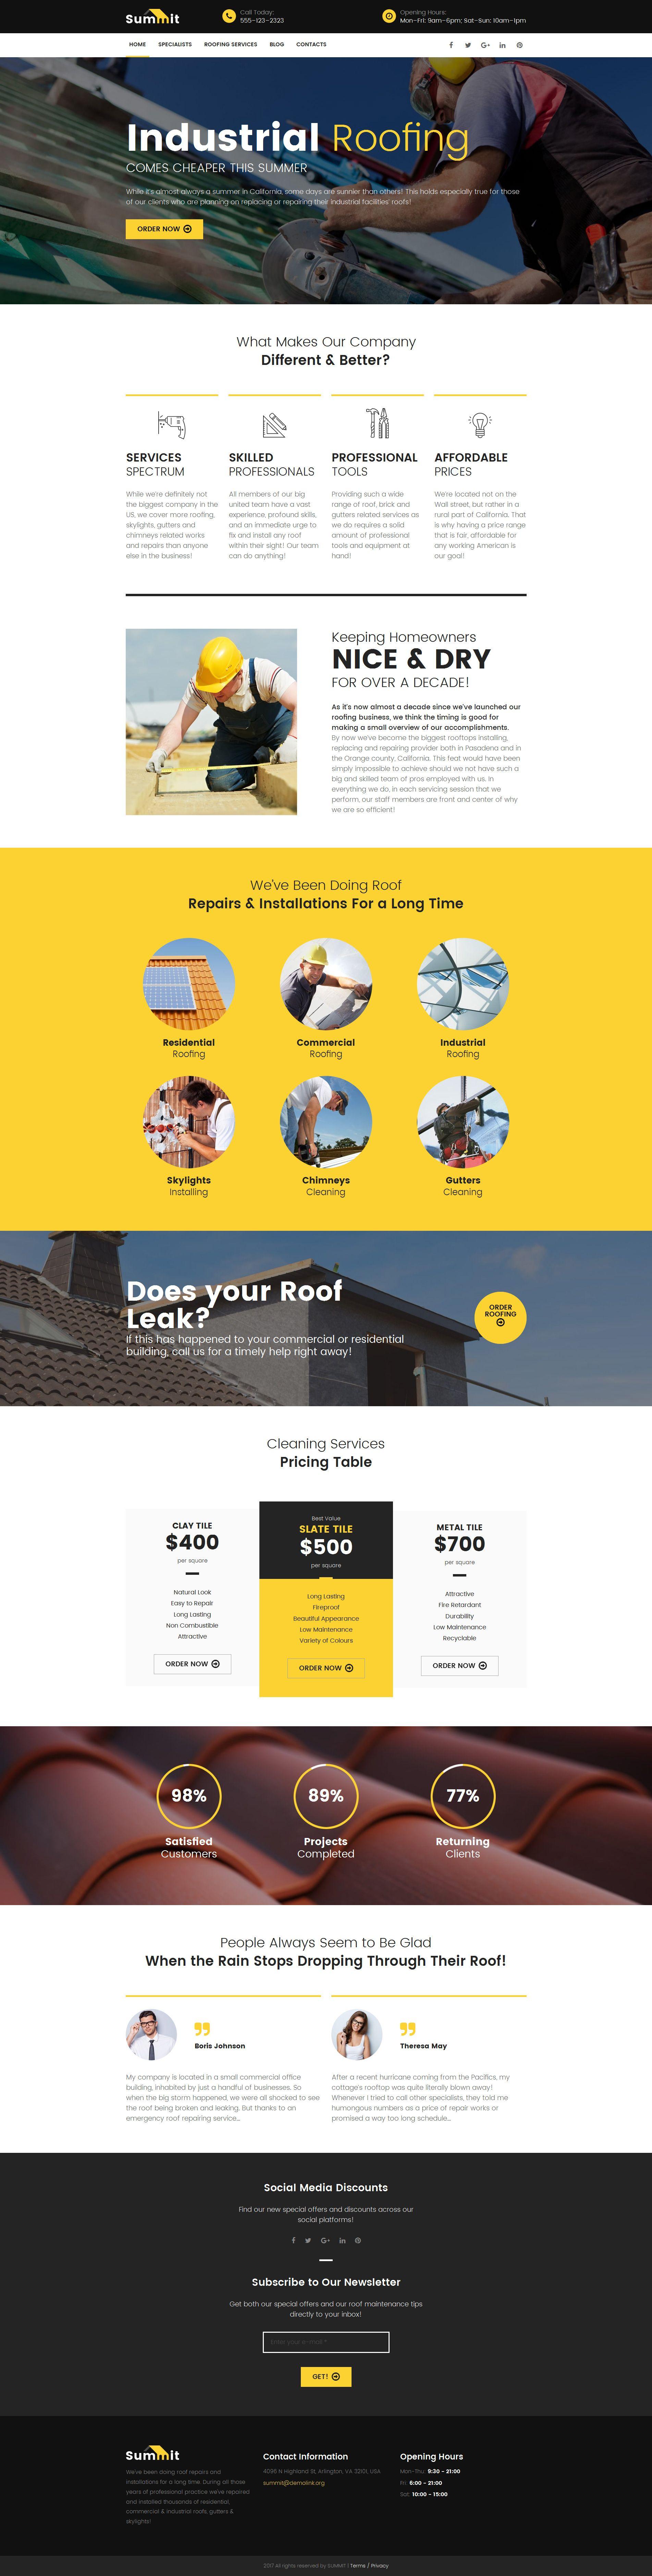 Roofing Company Responsive Moto CMS 3 Template | Handwerker